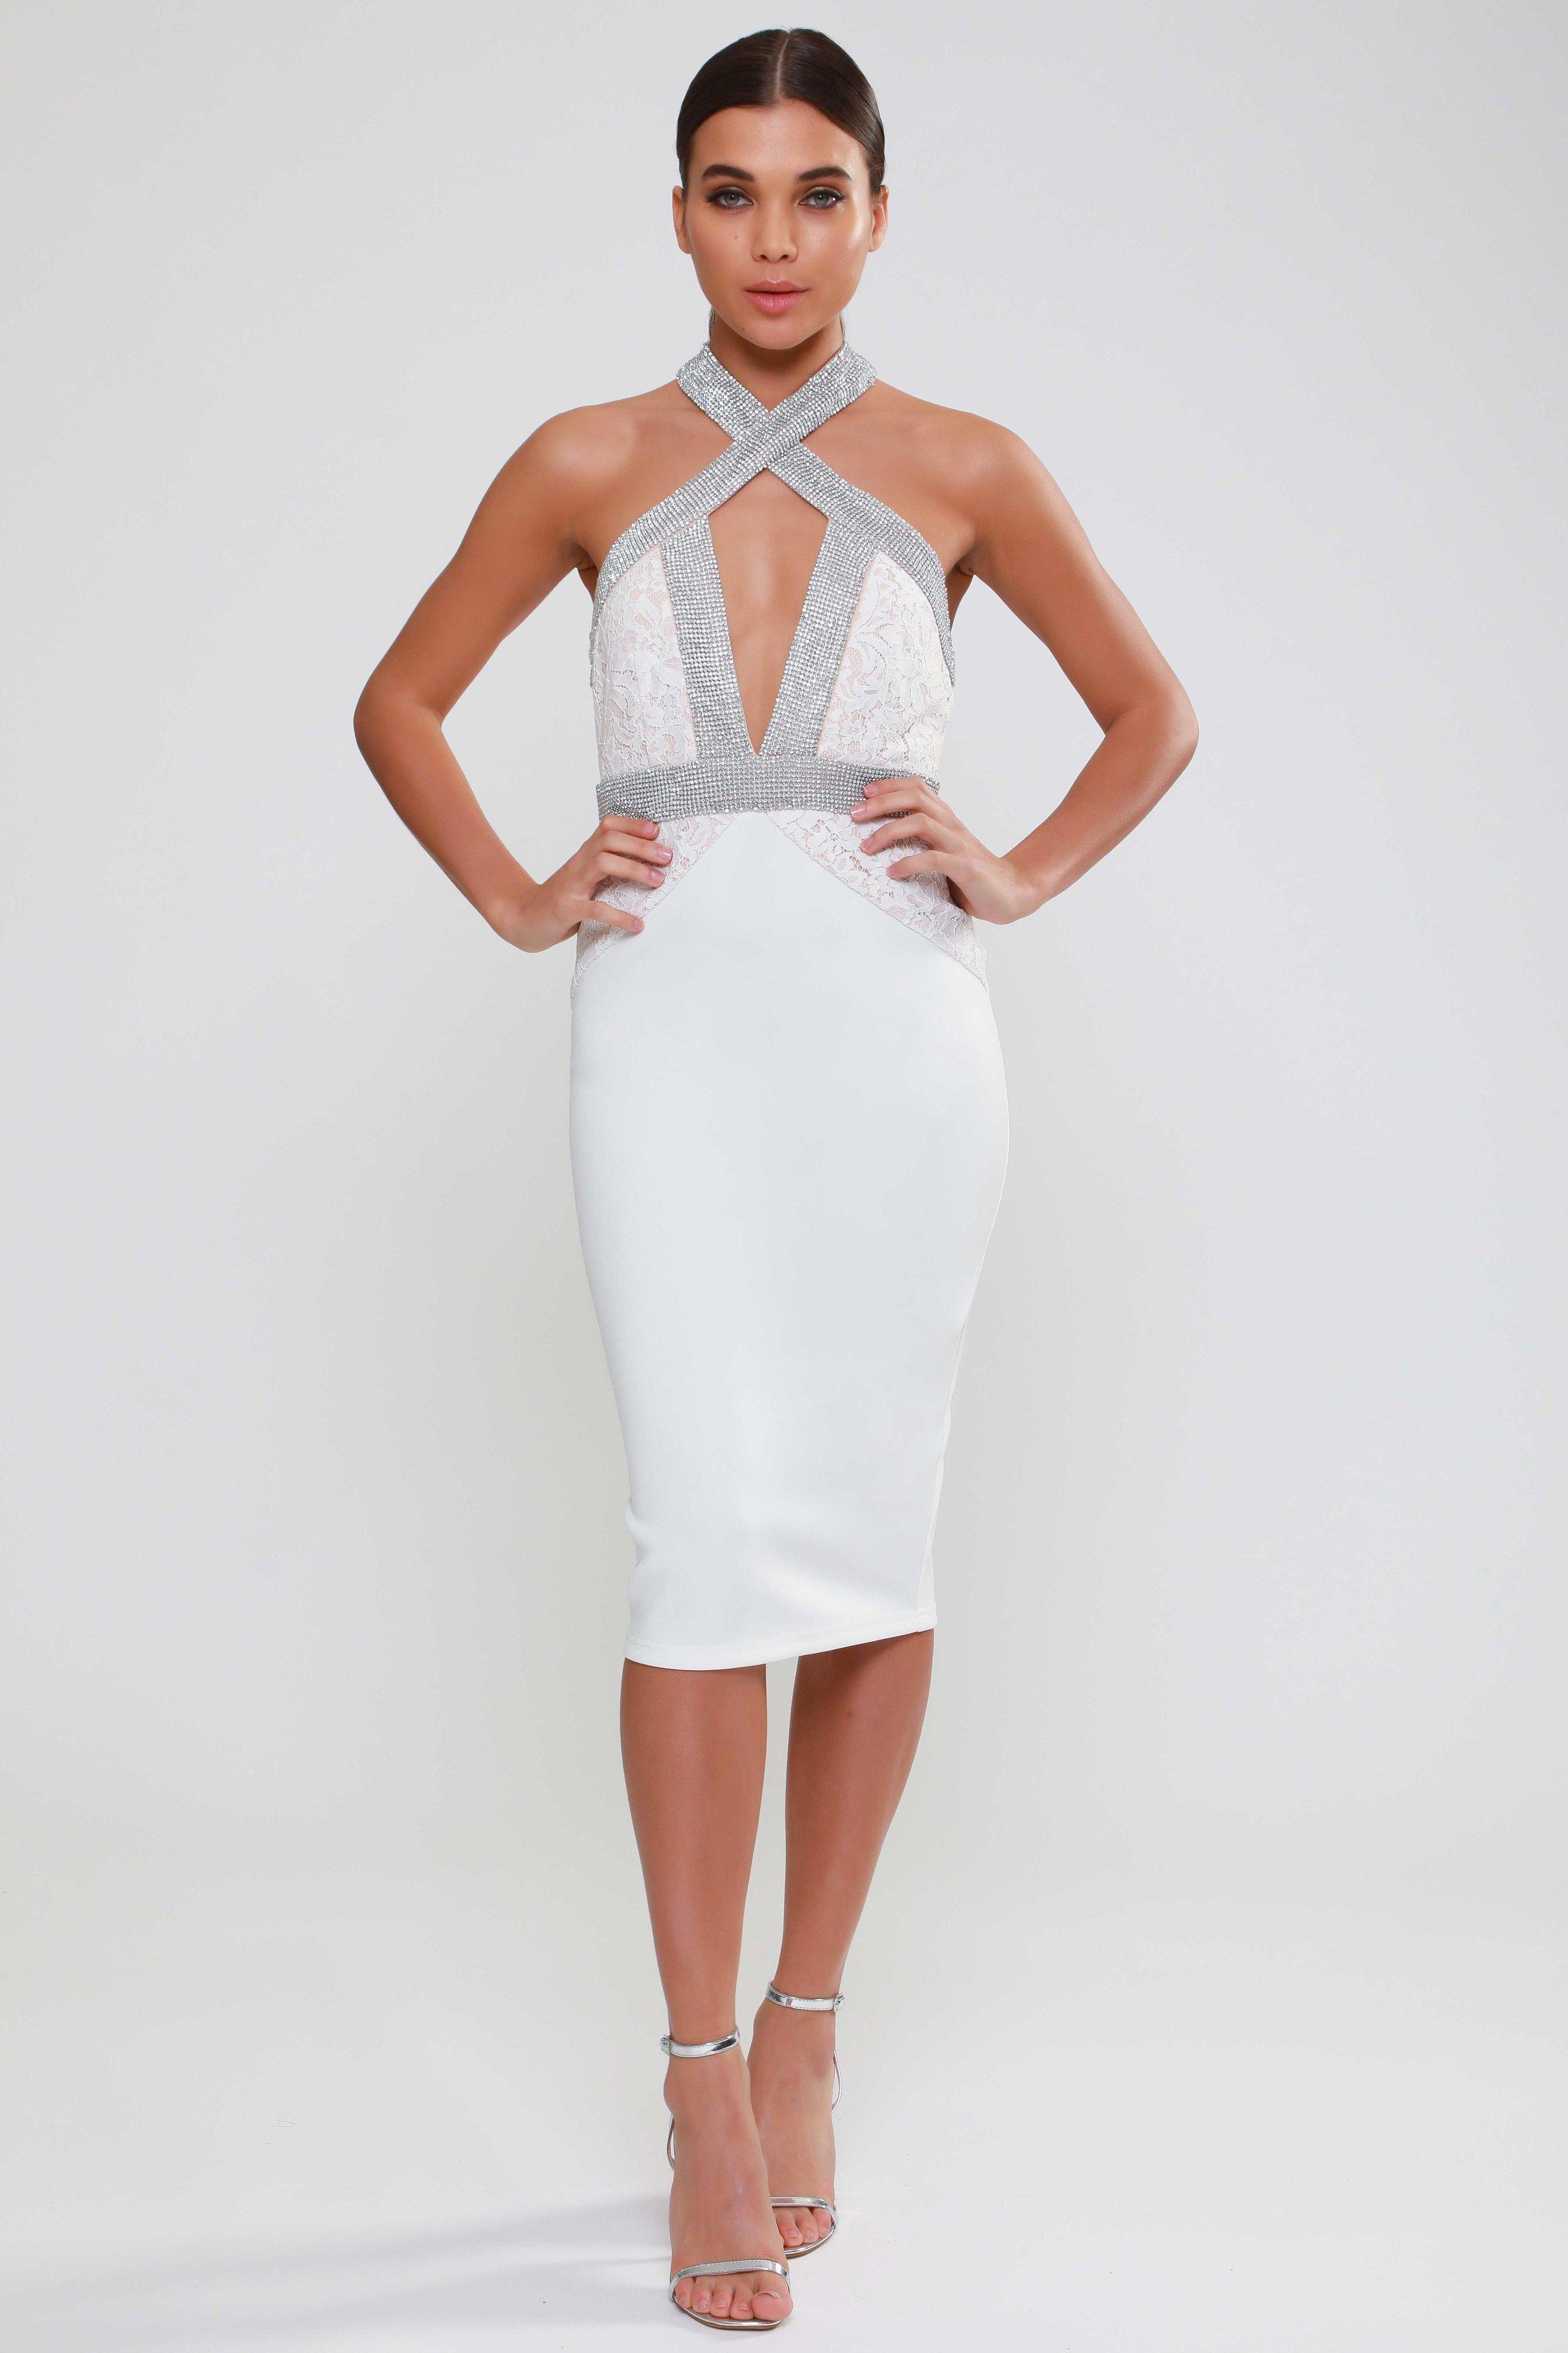 Diamante Cross Strap Midi Dress   £110.00